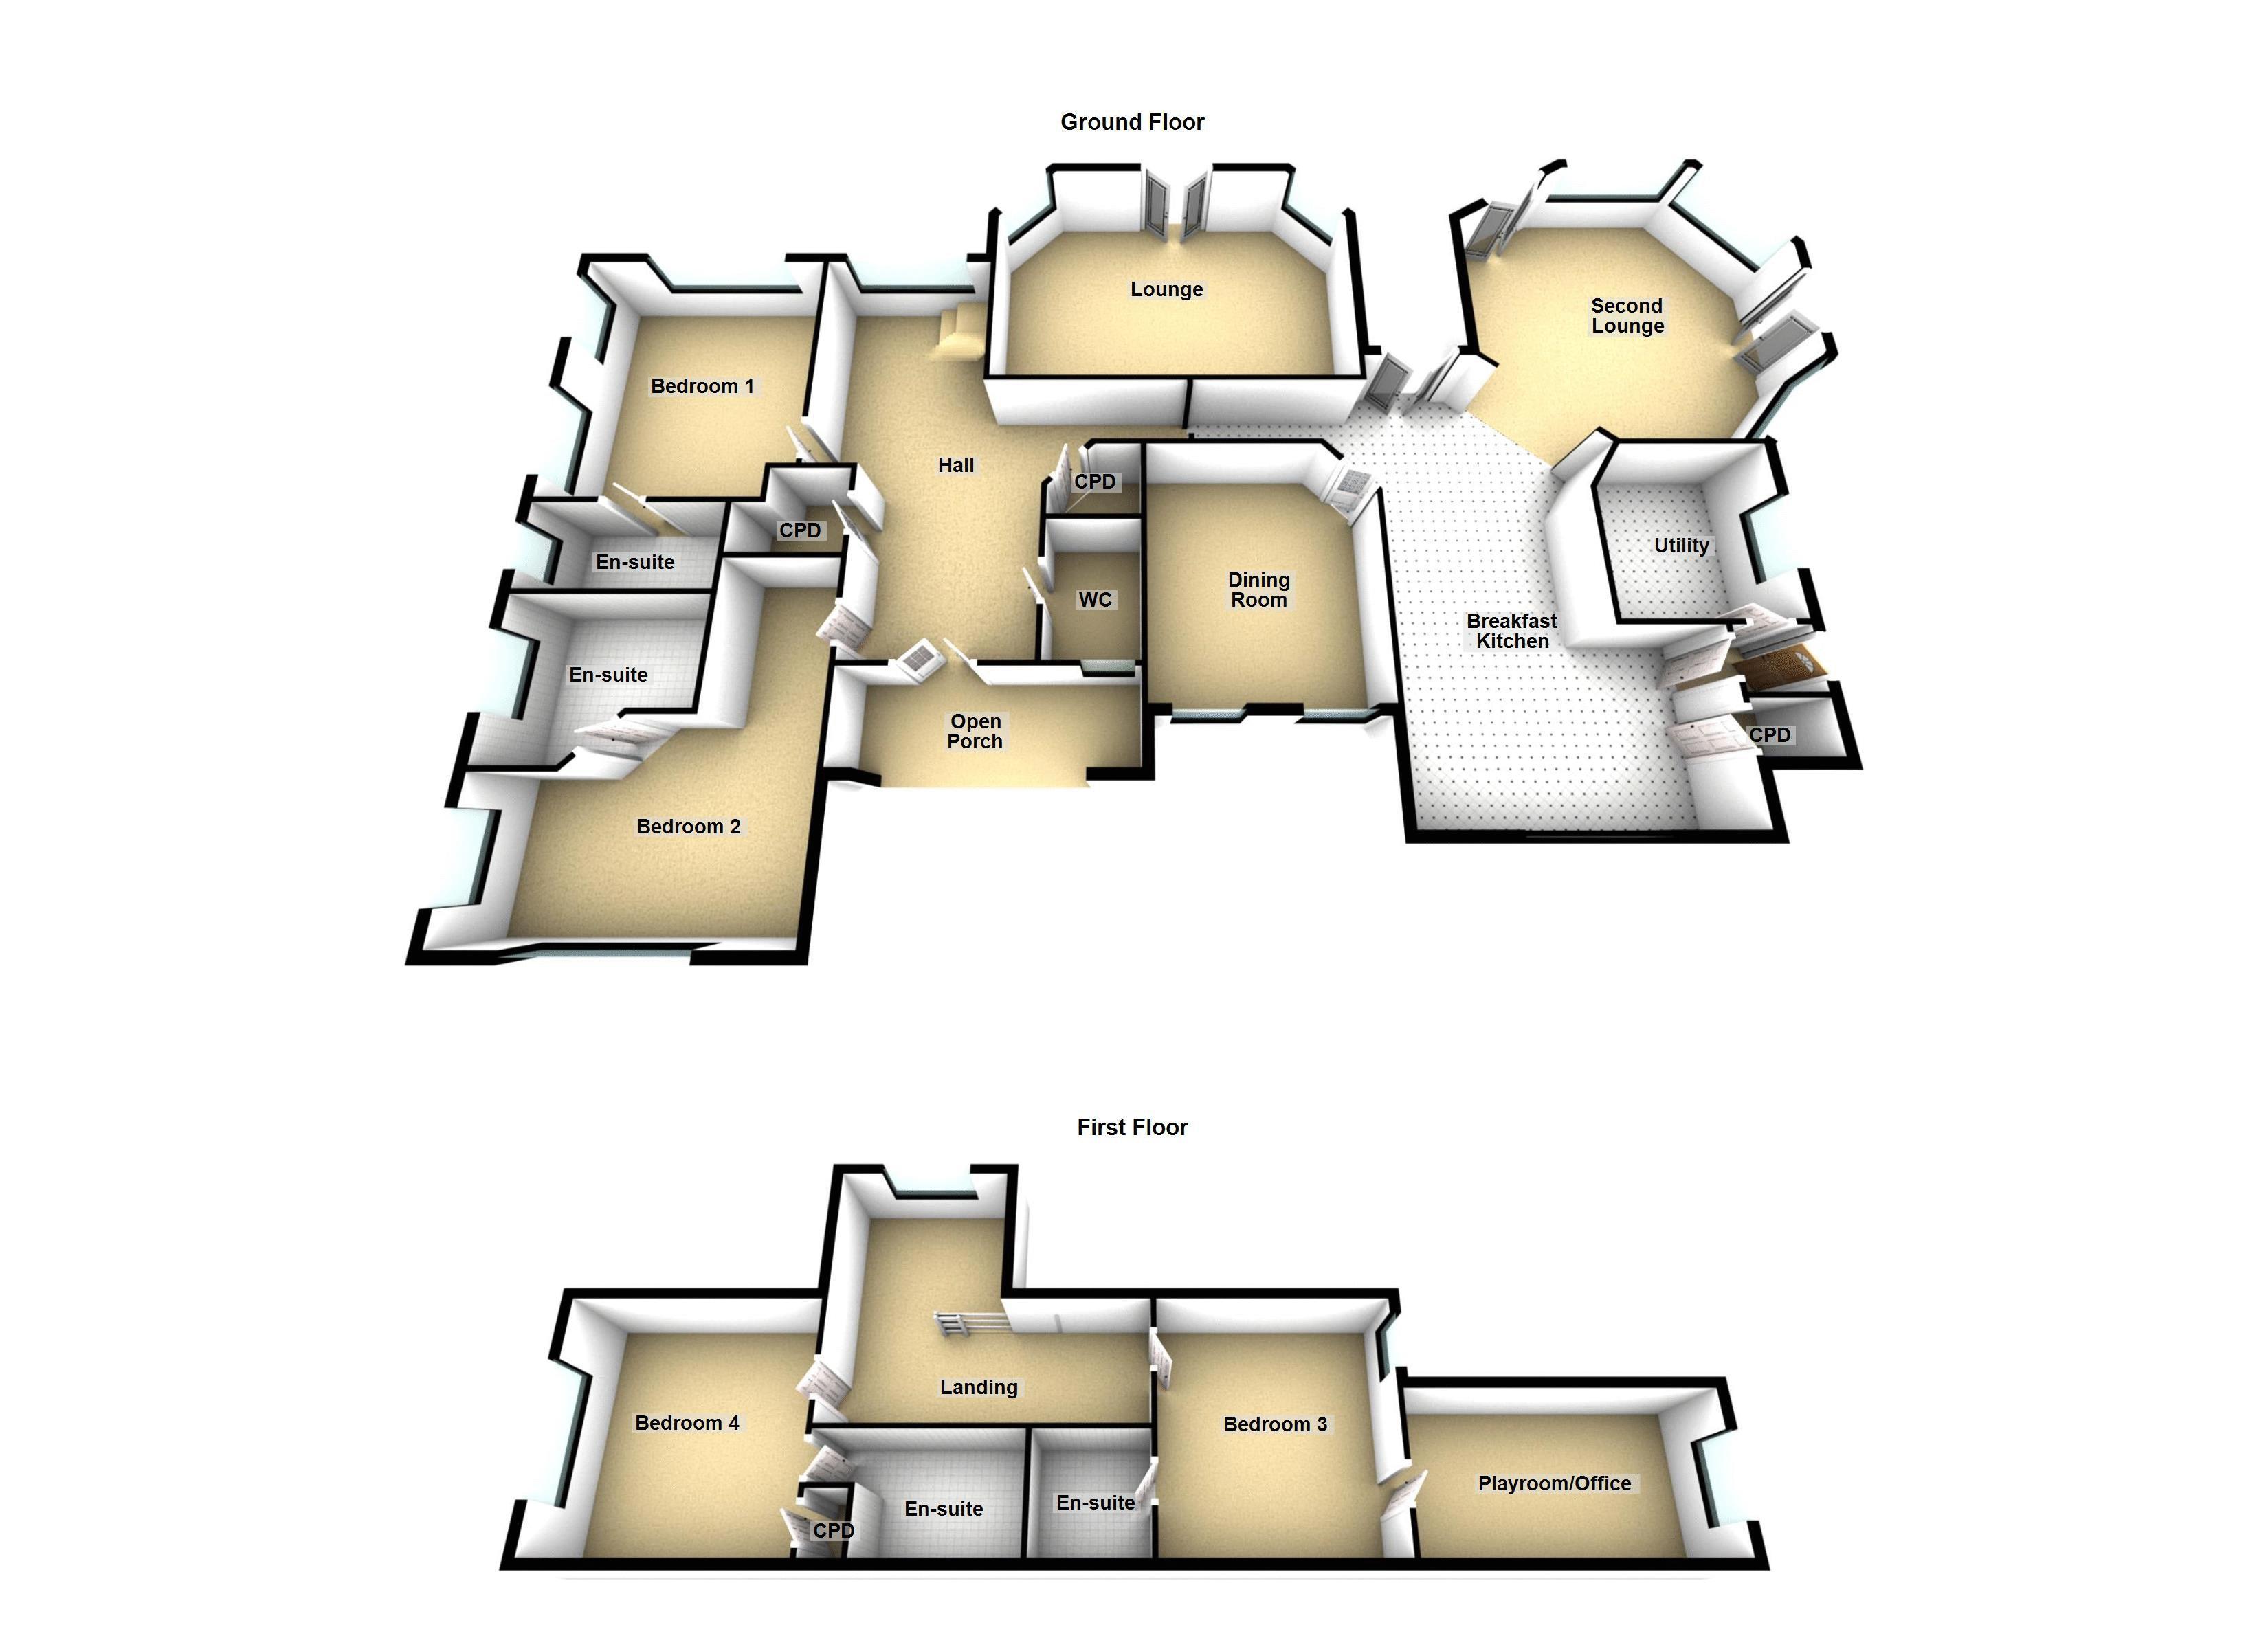 Ground/First Floors